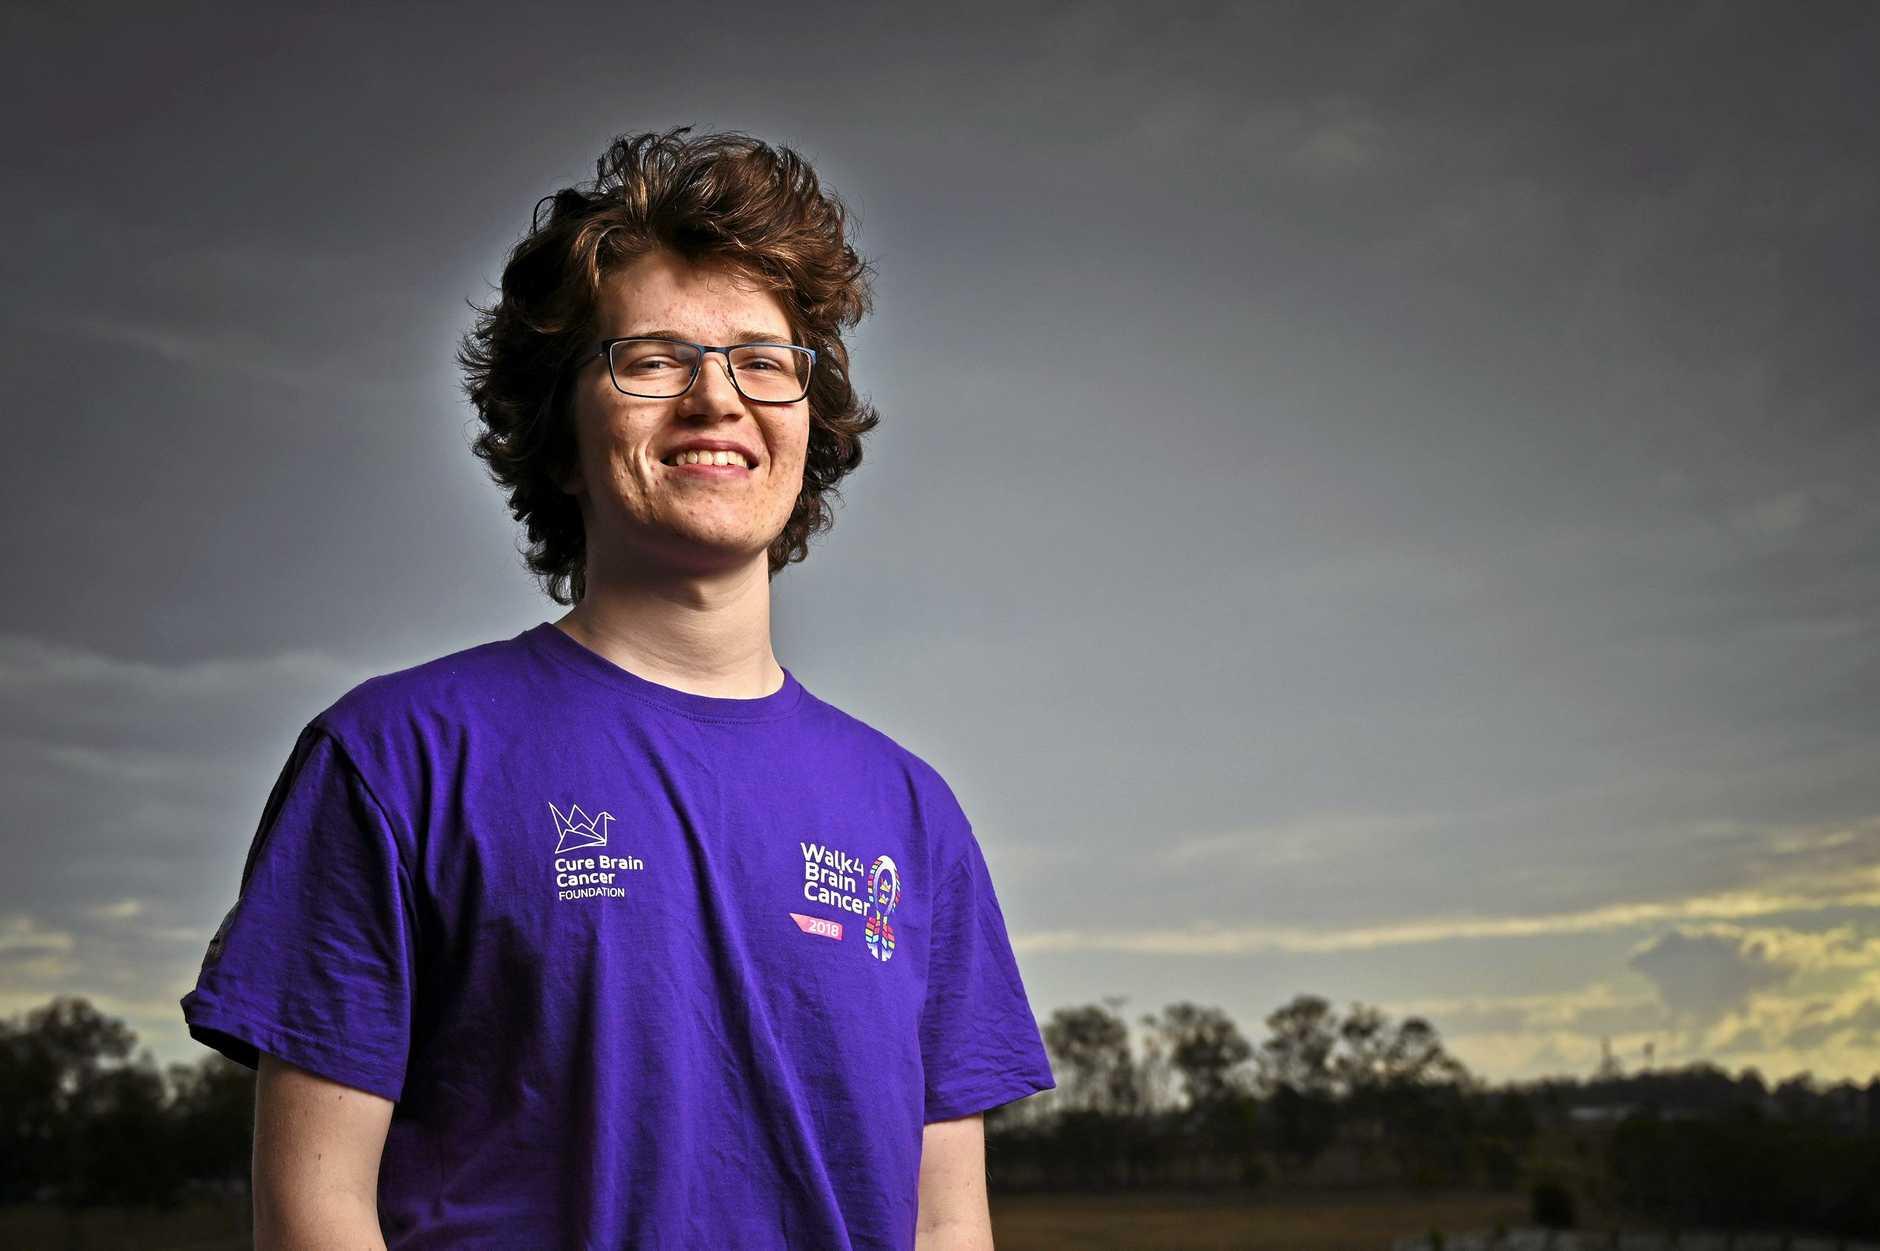 FIGHTER: Kieran McLeod is organising the 2019 Ipswich Walk 4 Brain Cancer event in Limestone Park. The inaugural walk was held last year.